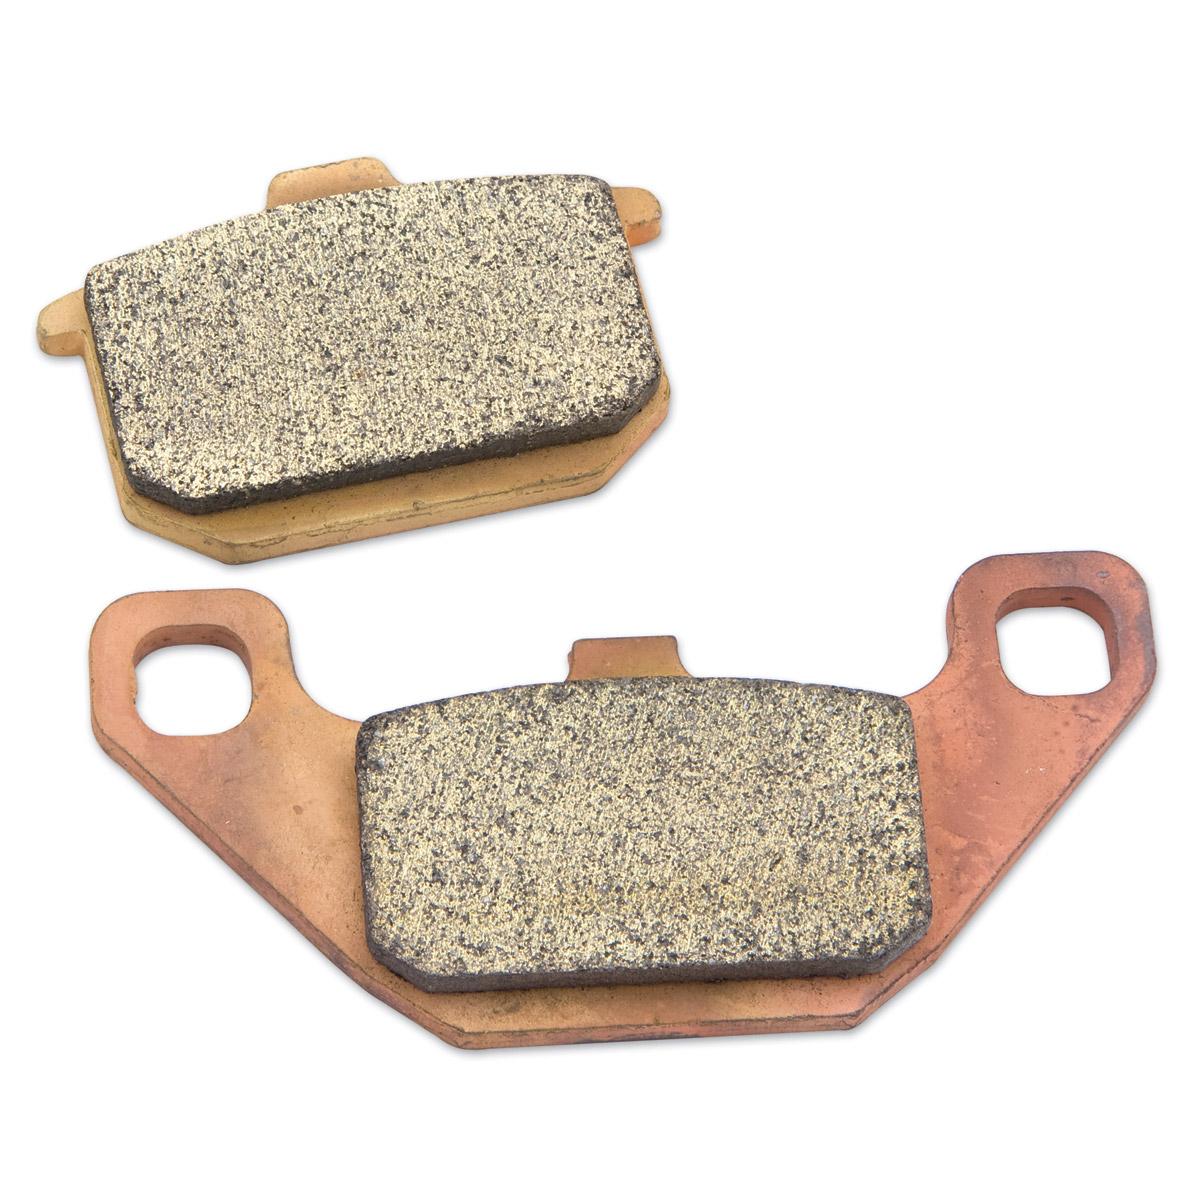 Ferodo Front or Rear Sintered Brake Pads